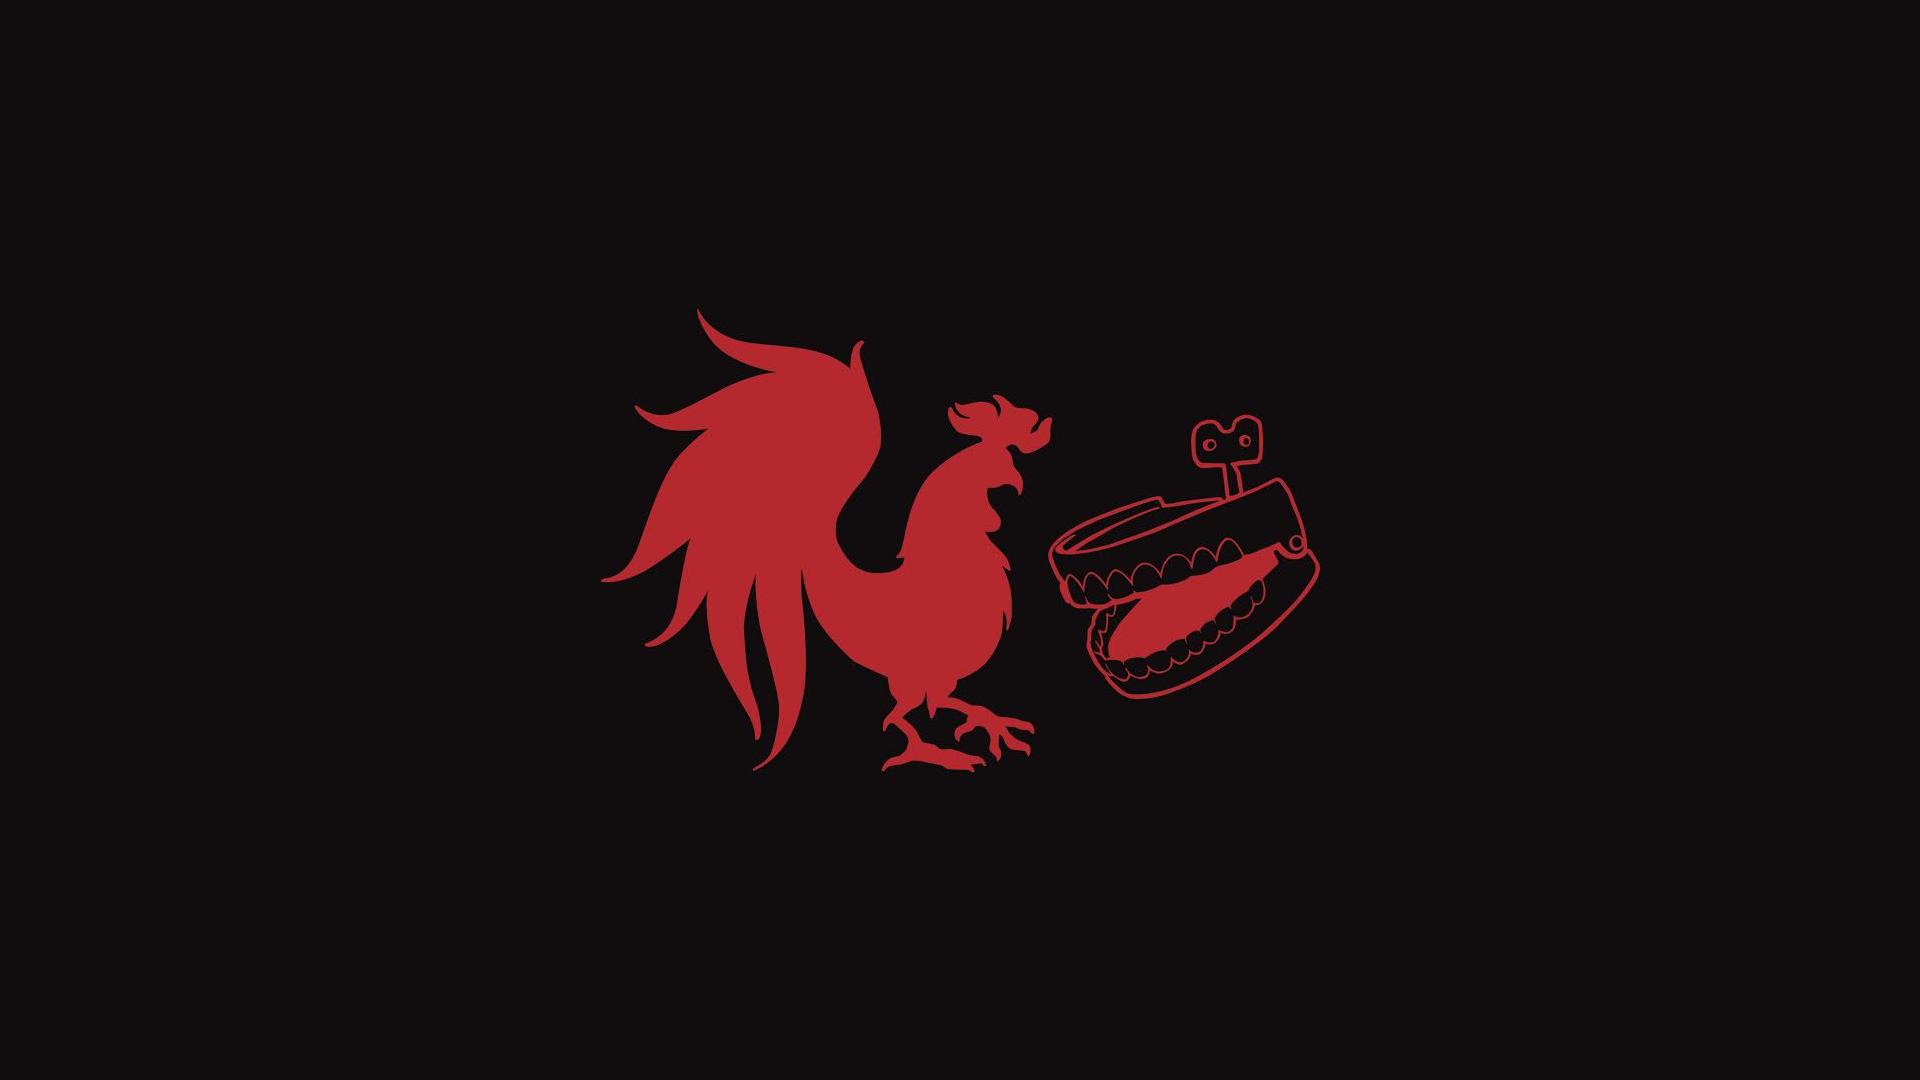 rooster teeth logo by orangeman80 customization wallpaper minimalistic 1920x1080